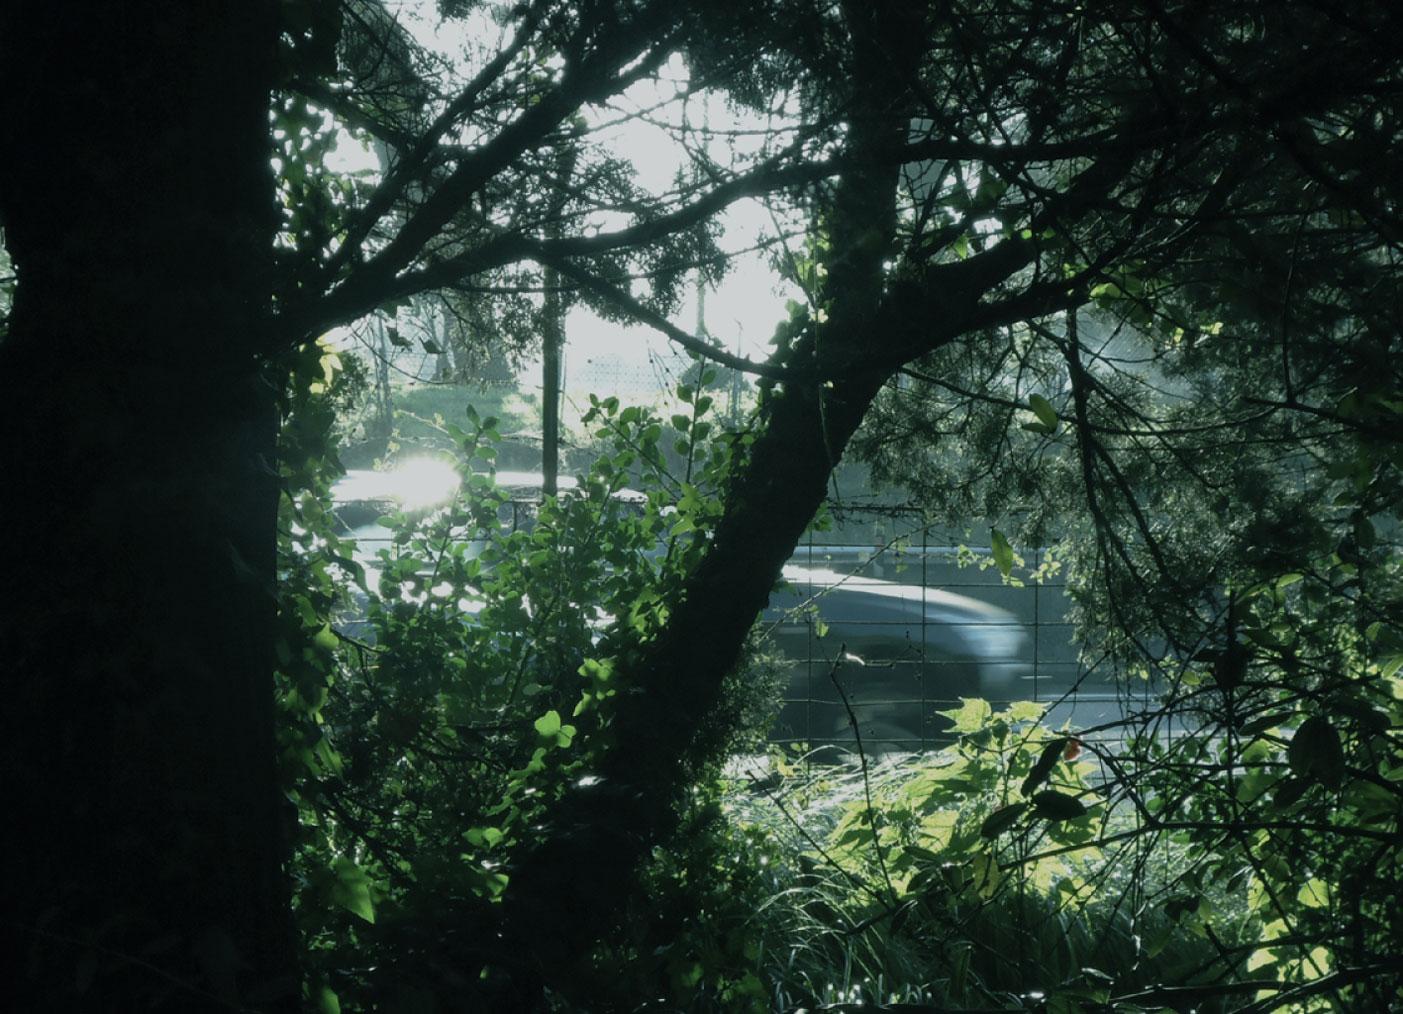 selva-urbana-10.jpg